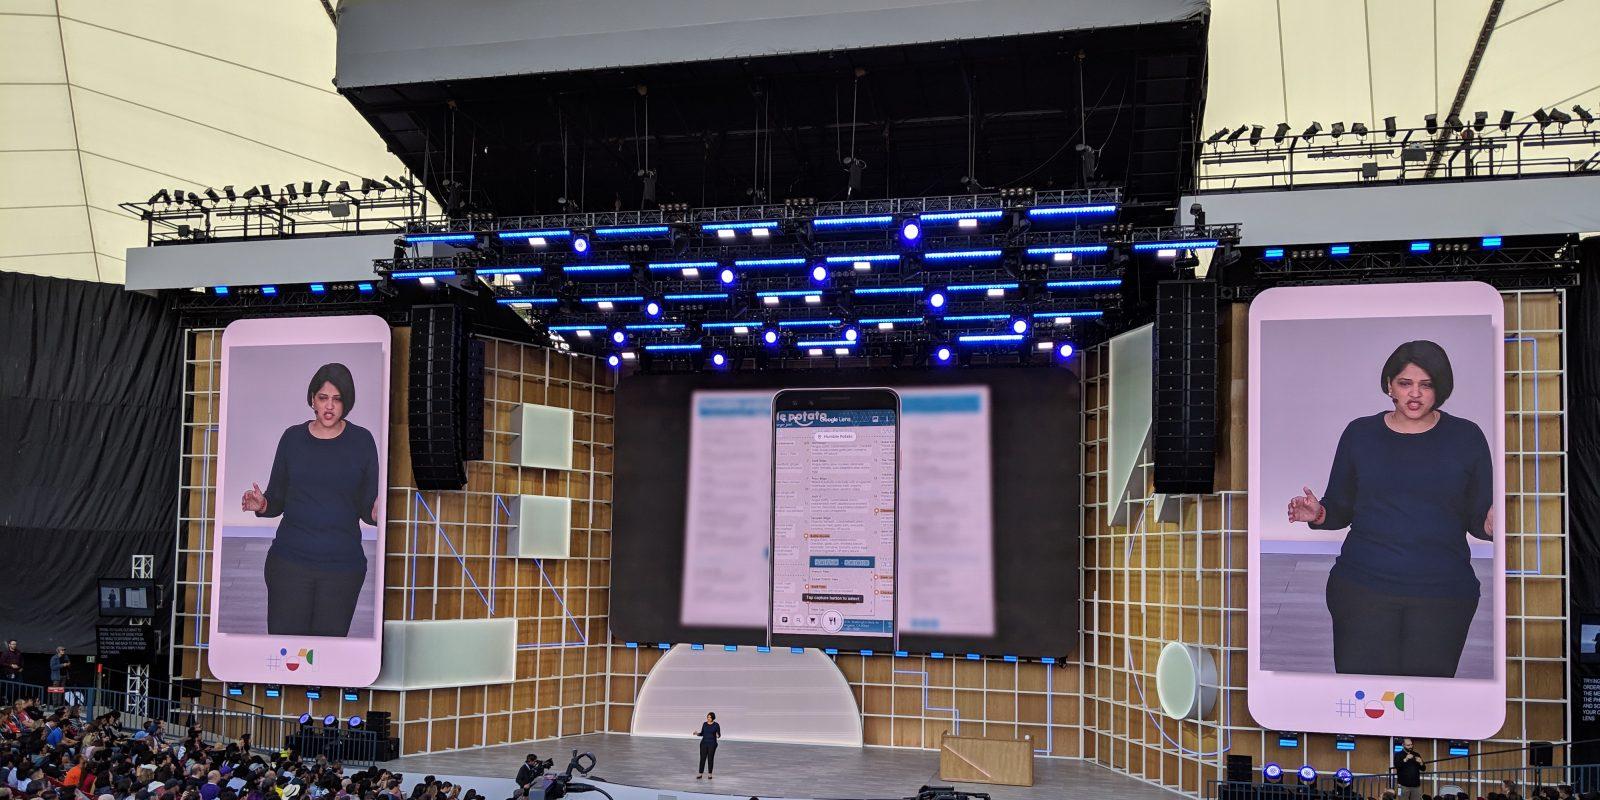 Google Lens adding new tools to highlight menus, split checks